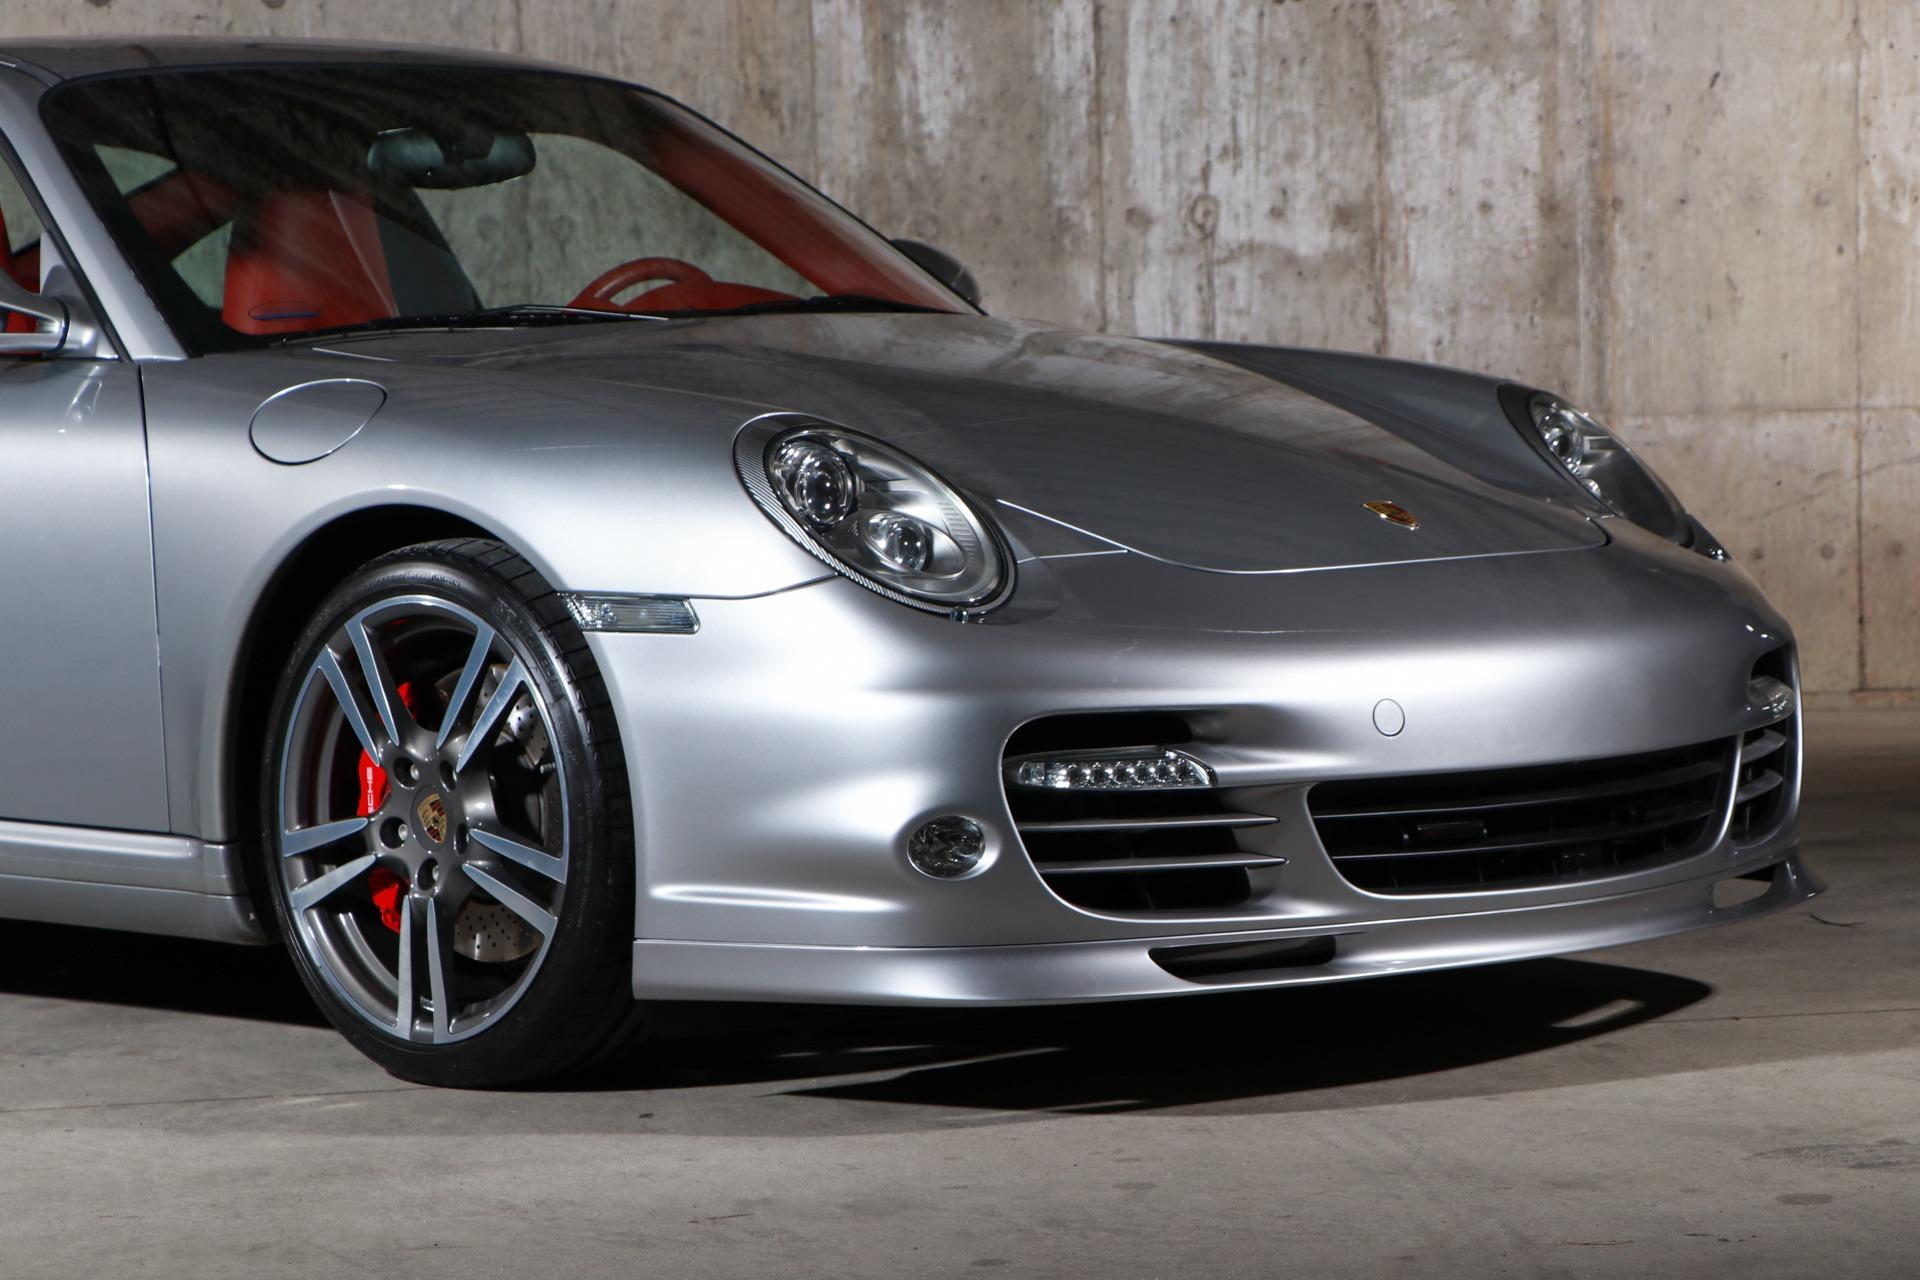 Used 2011 Porsche 911 Turbo   Glen Cove, NY